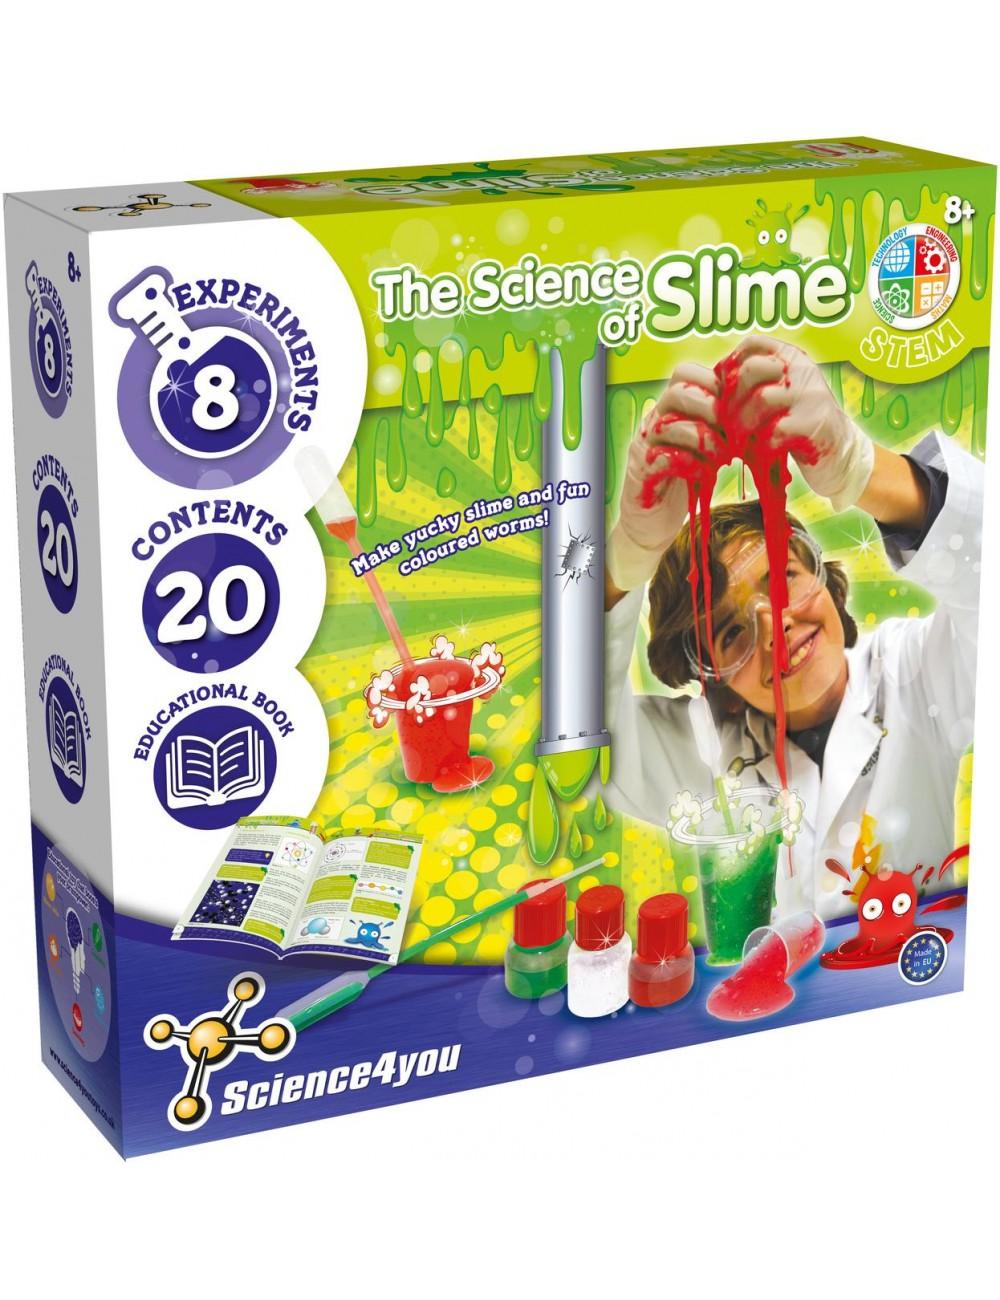 Slime Kit - The Science of Slime